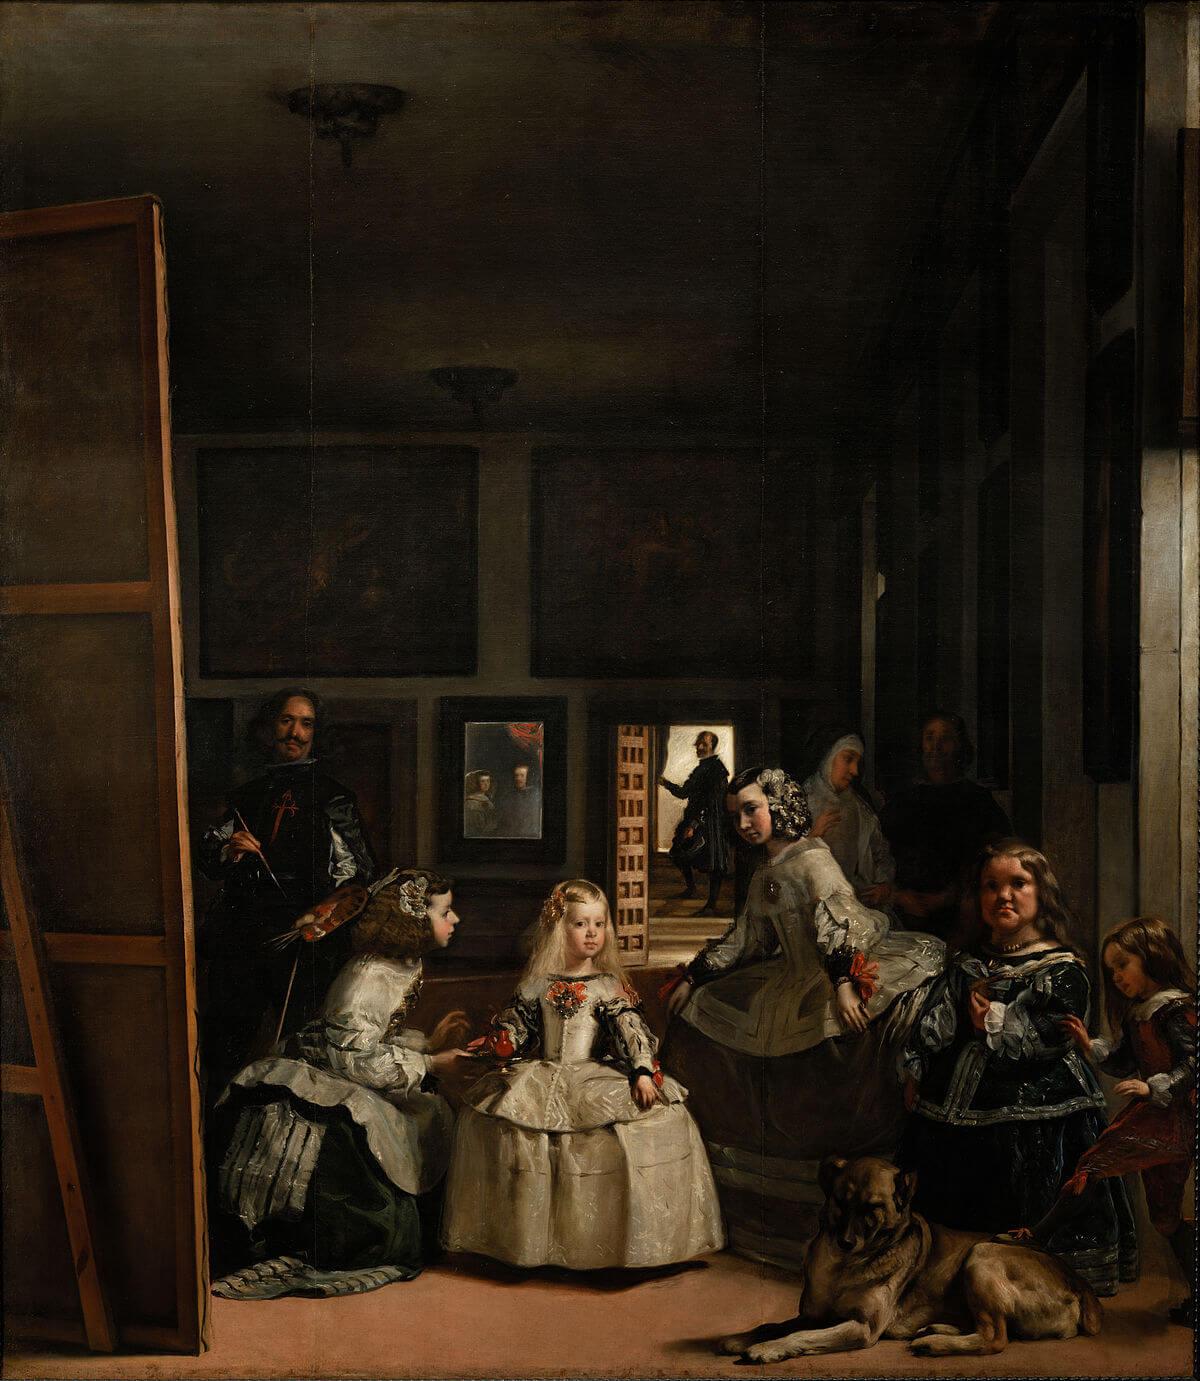 Barok sanat. Velazquez. Nedimeler.